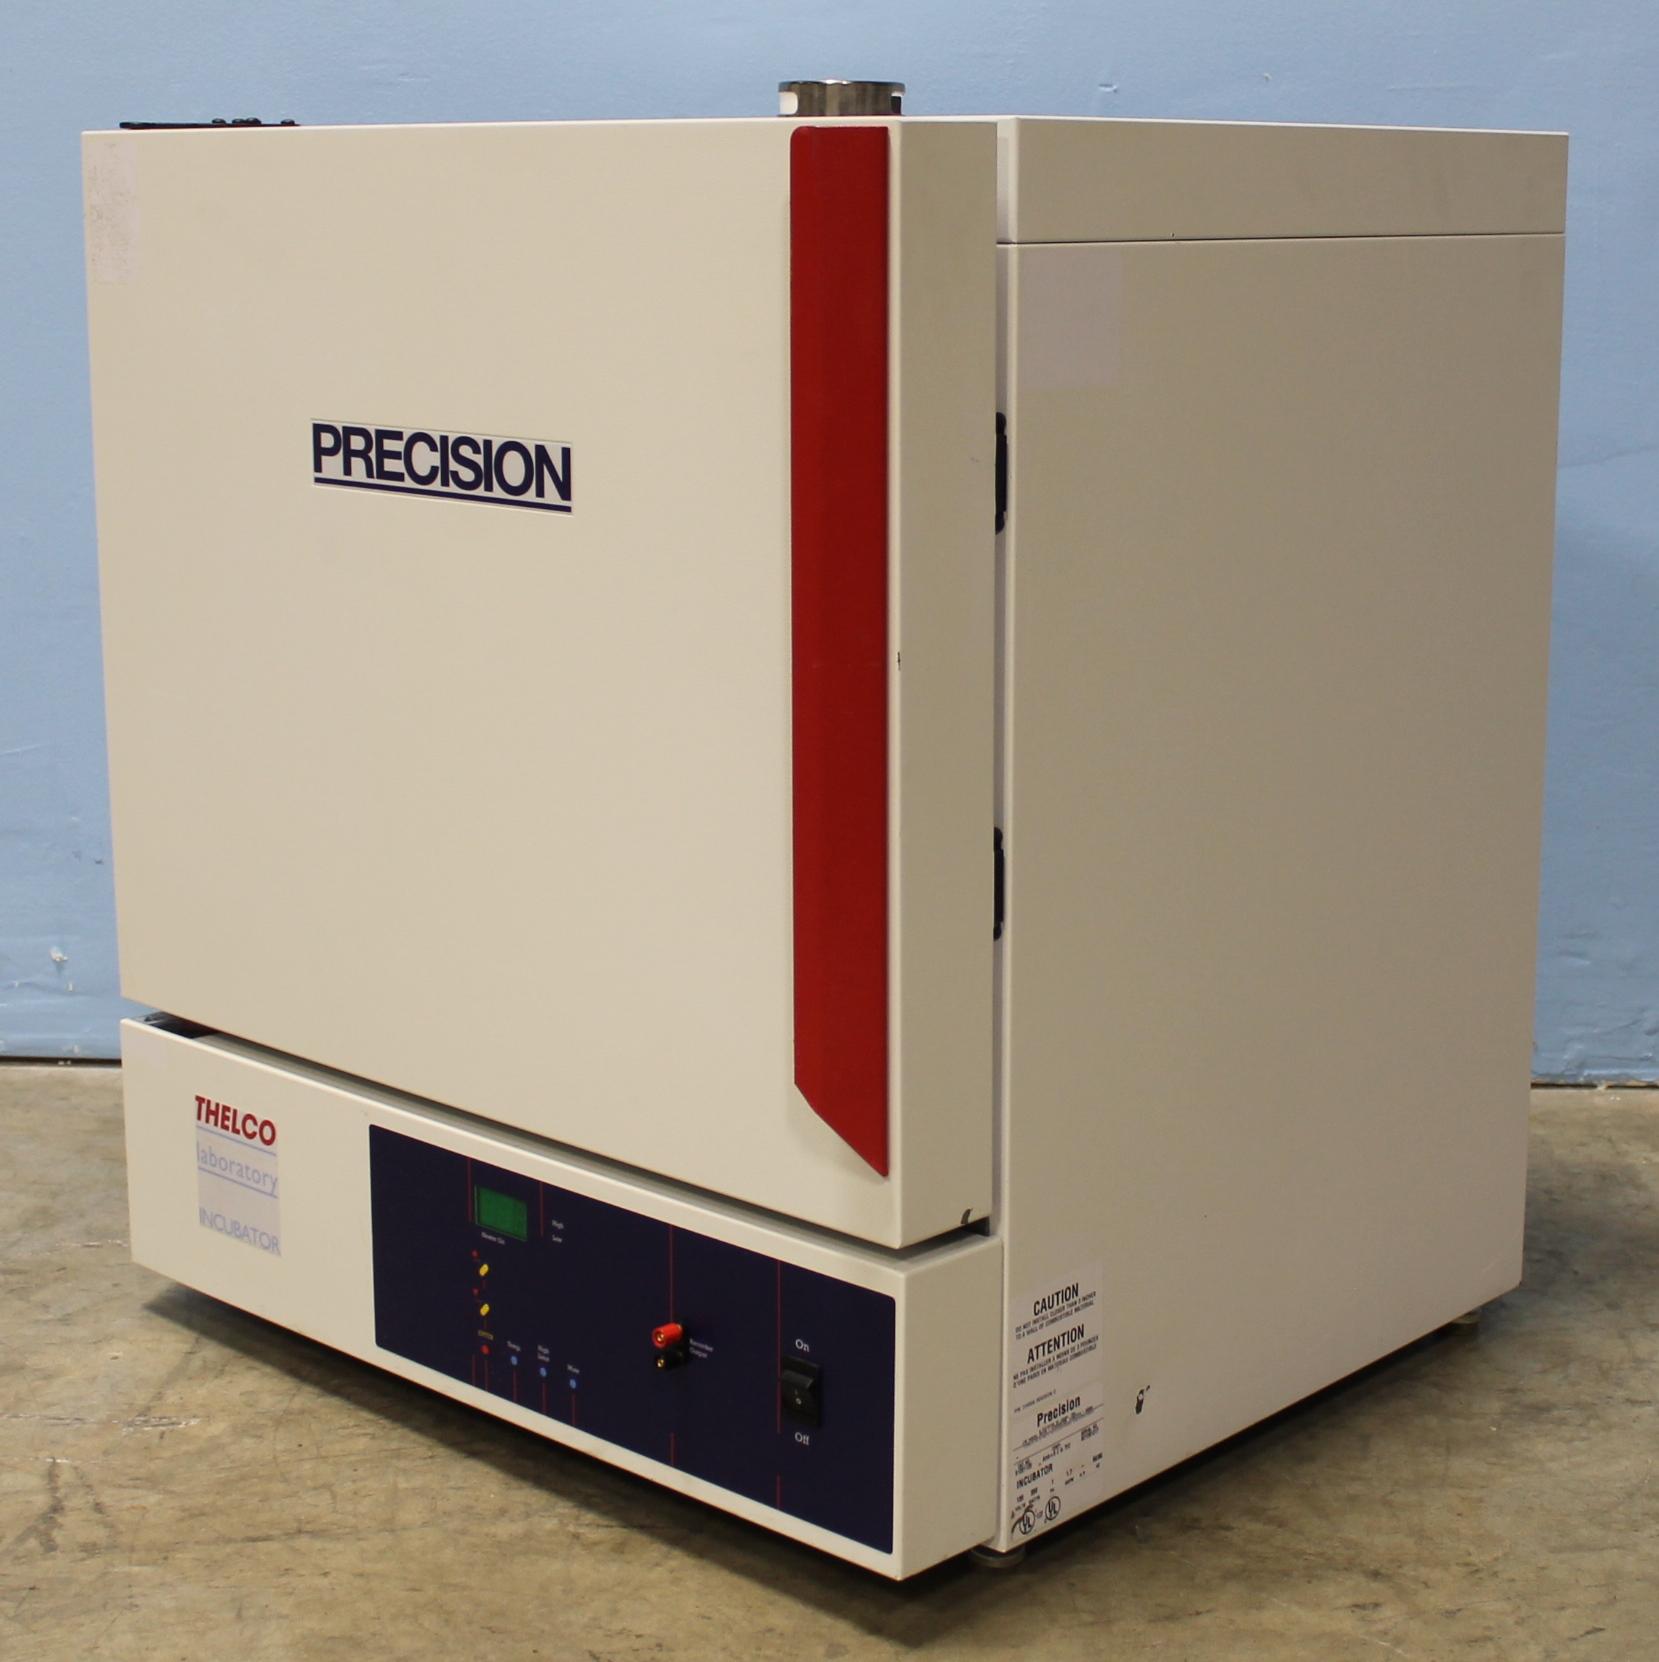 Refurbished Precision Thelco Gravity Convection Incubator